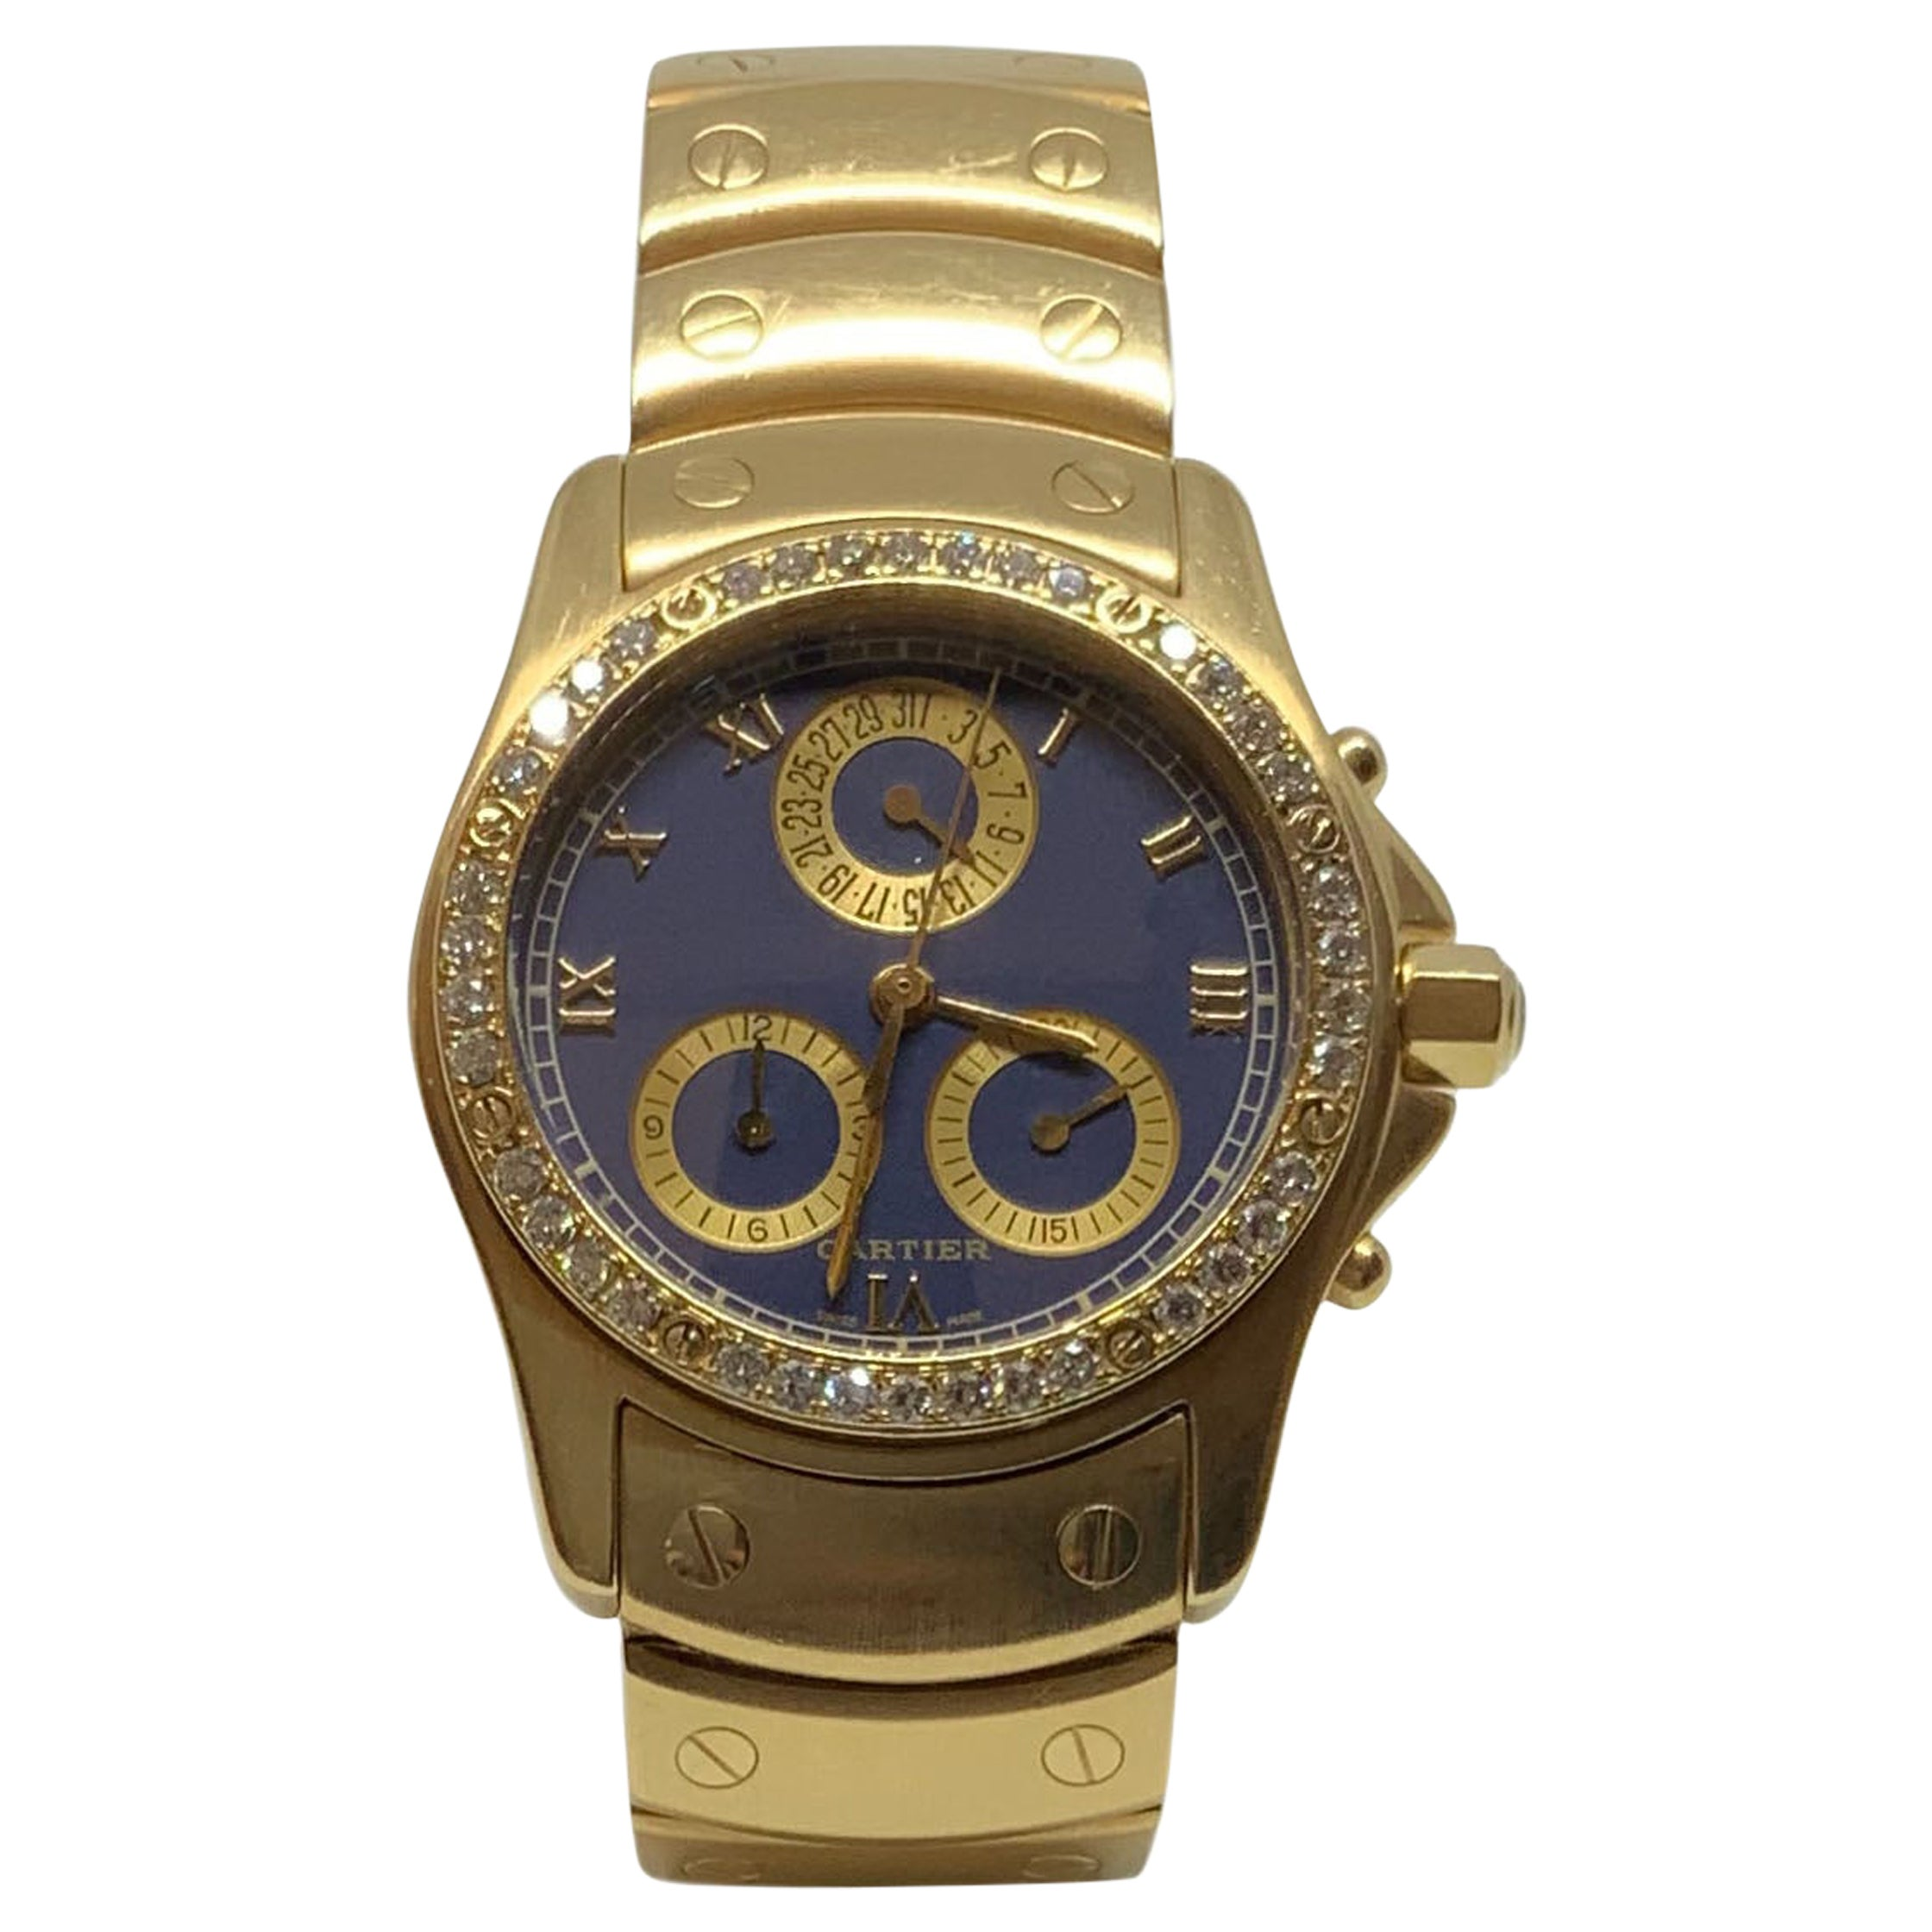 Cartier 18 Karat Yellow Gold Santos Ronde MM Chrono Watch